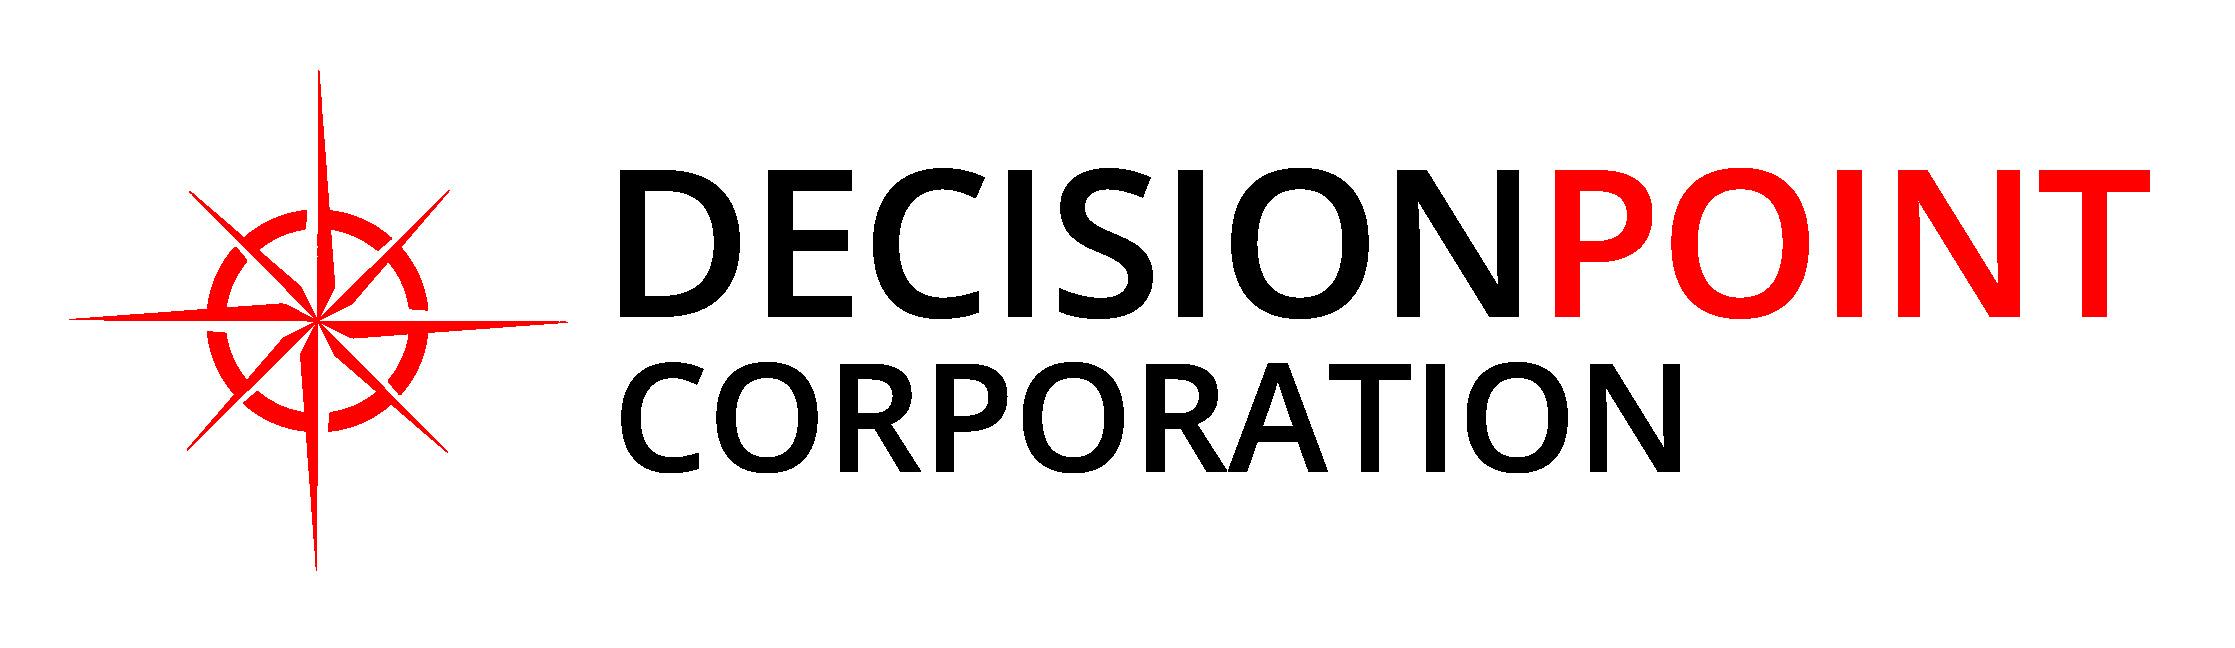 Decision Point corporation logo